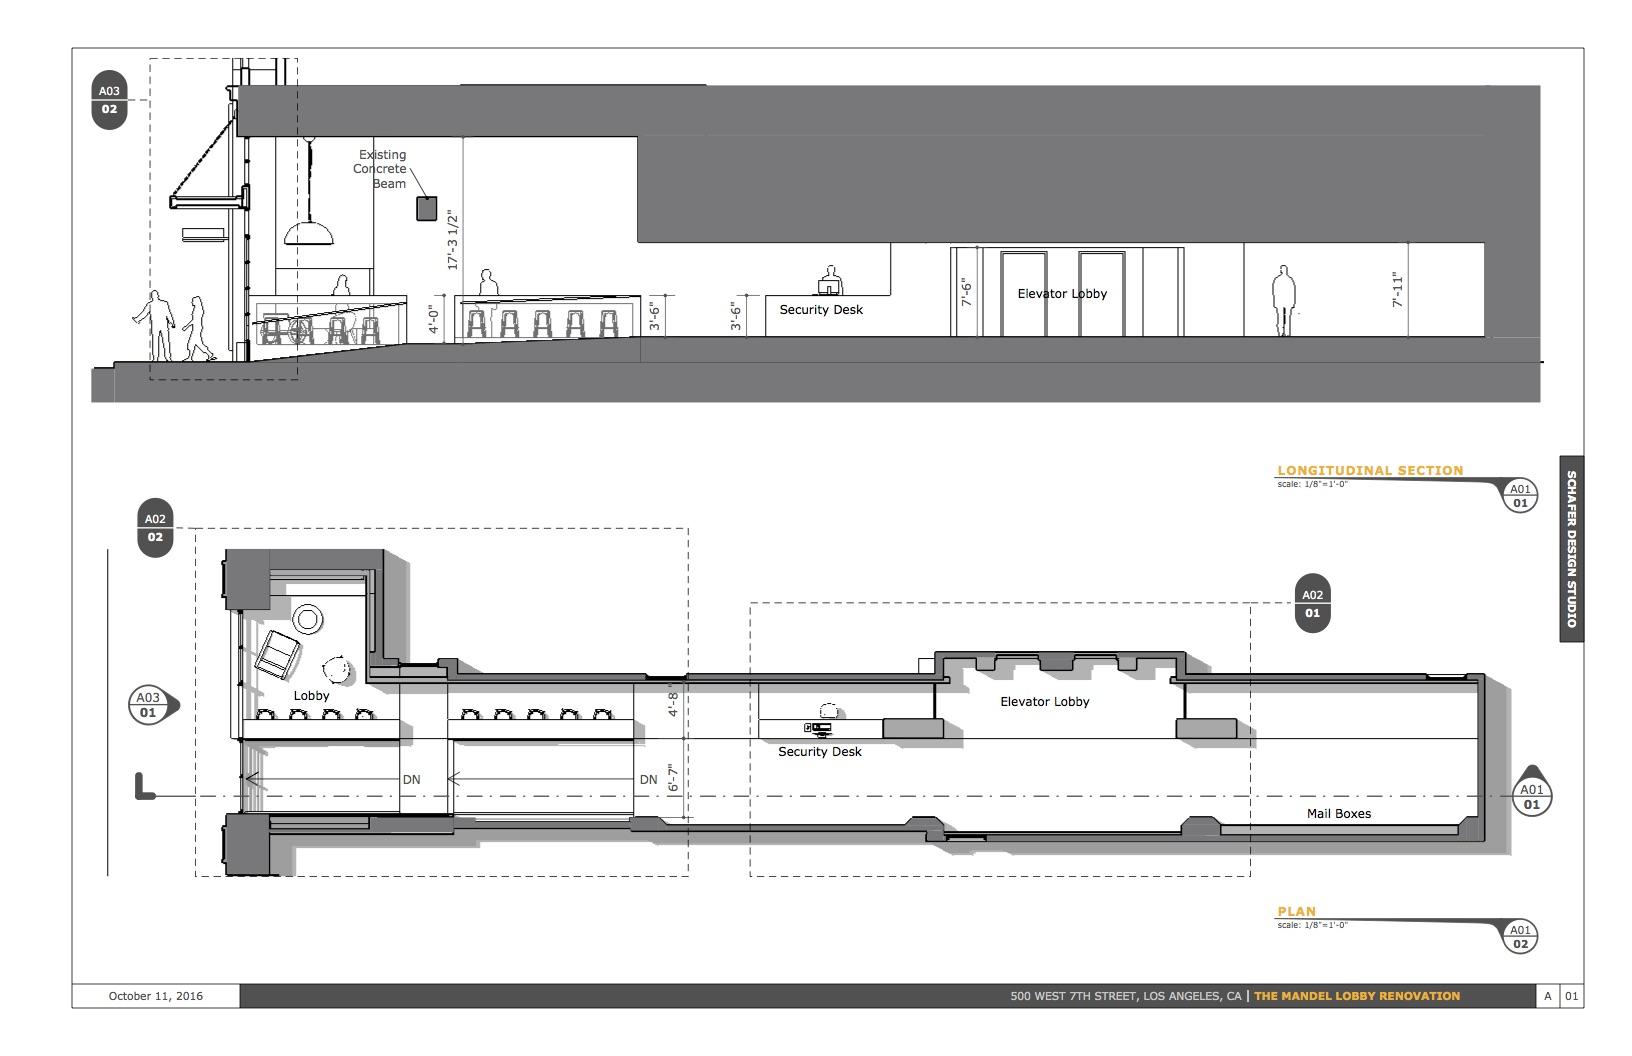 Floor Plan - Section B-W